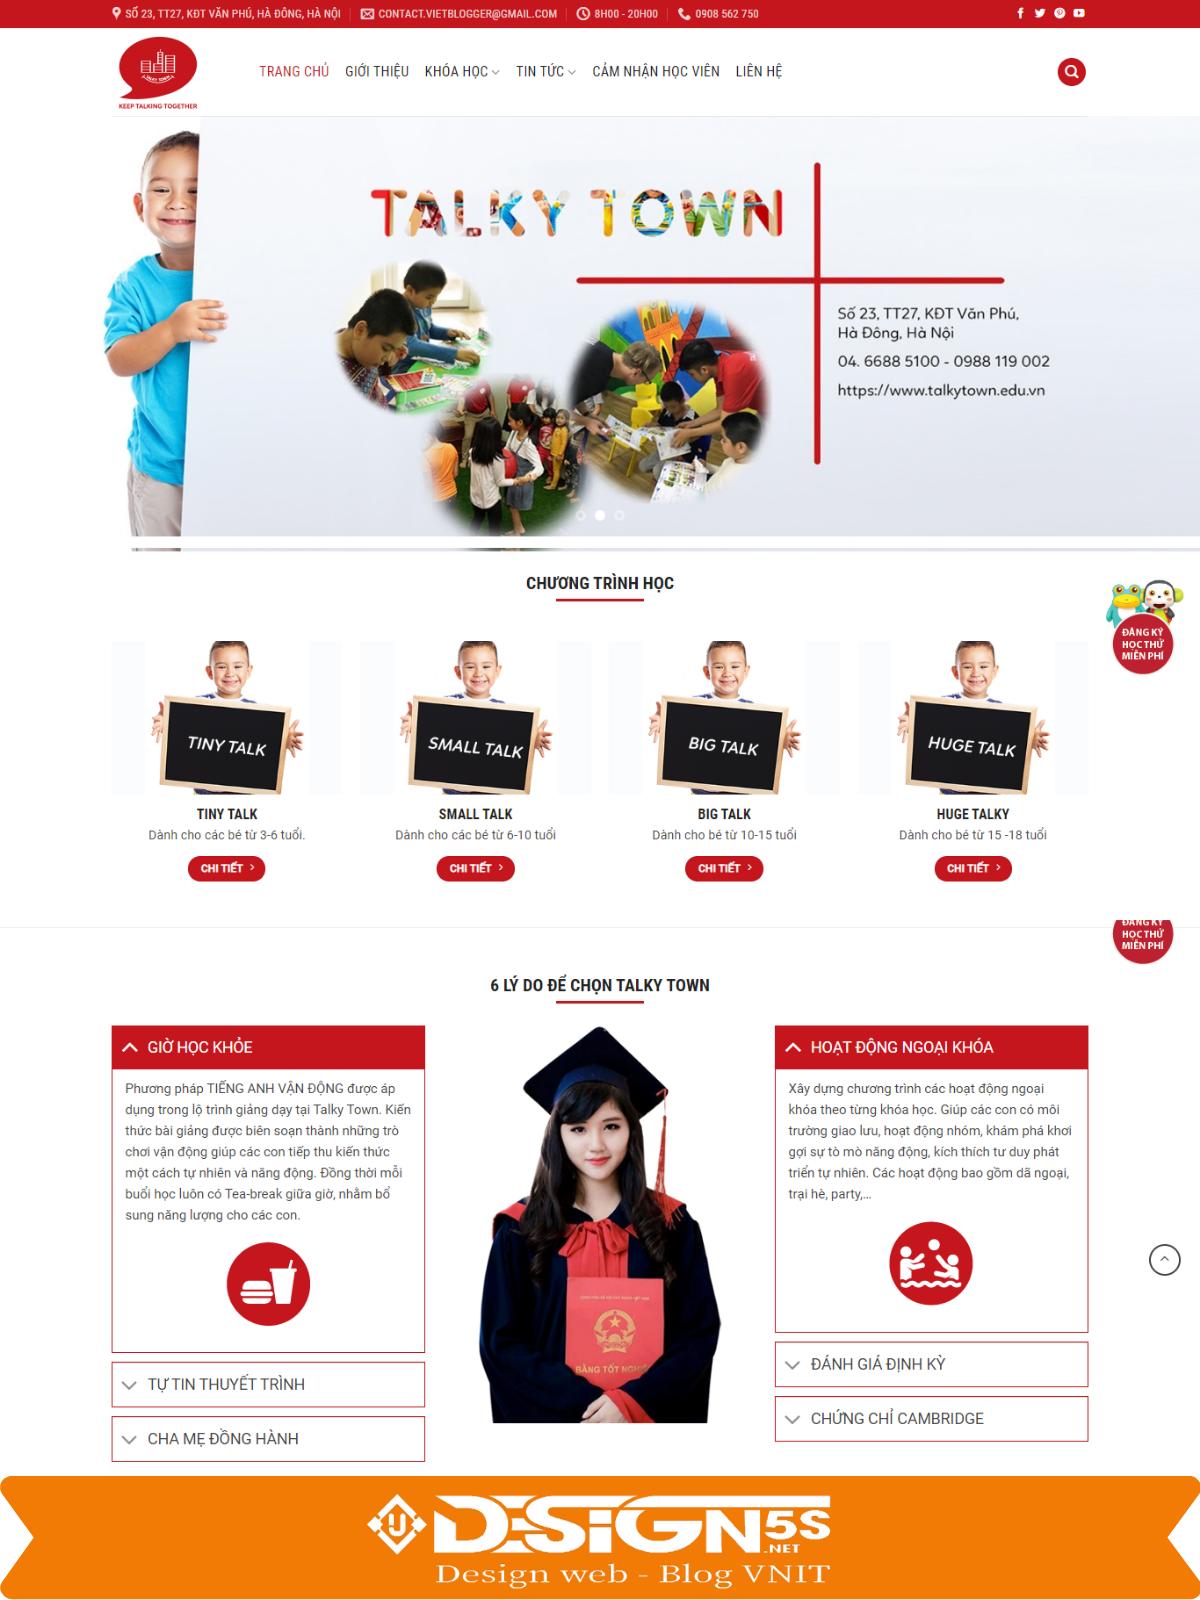 Mẫu Website landing page trung tâm tiếng Anh